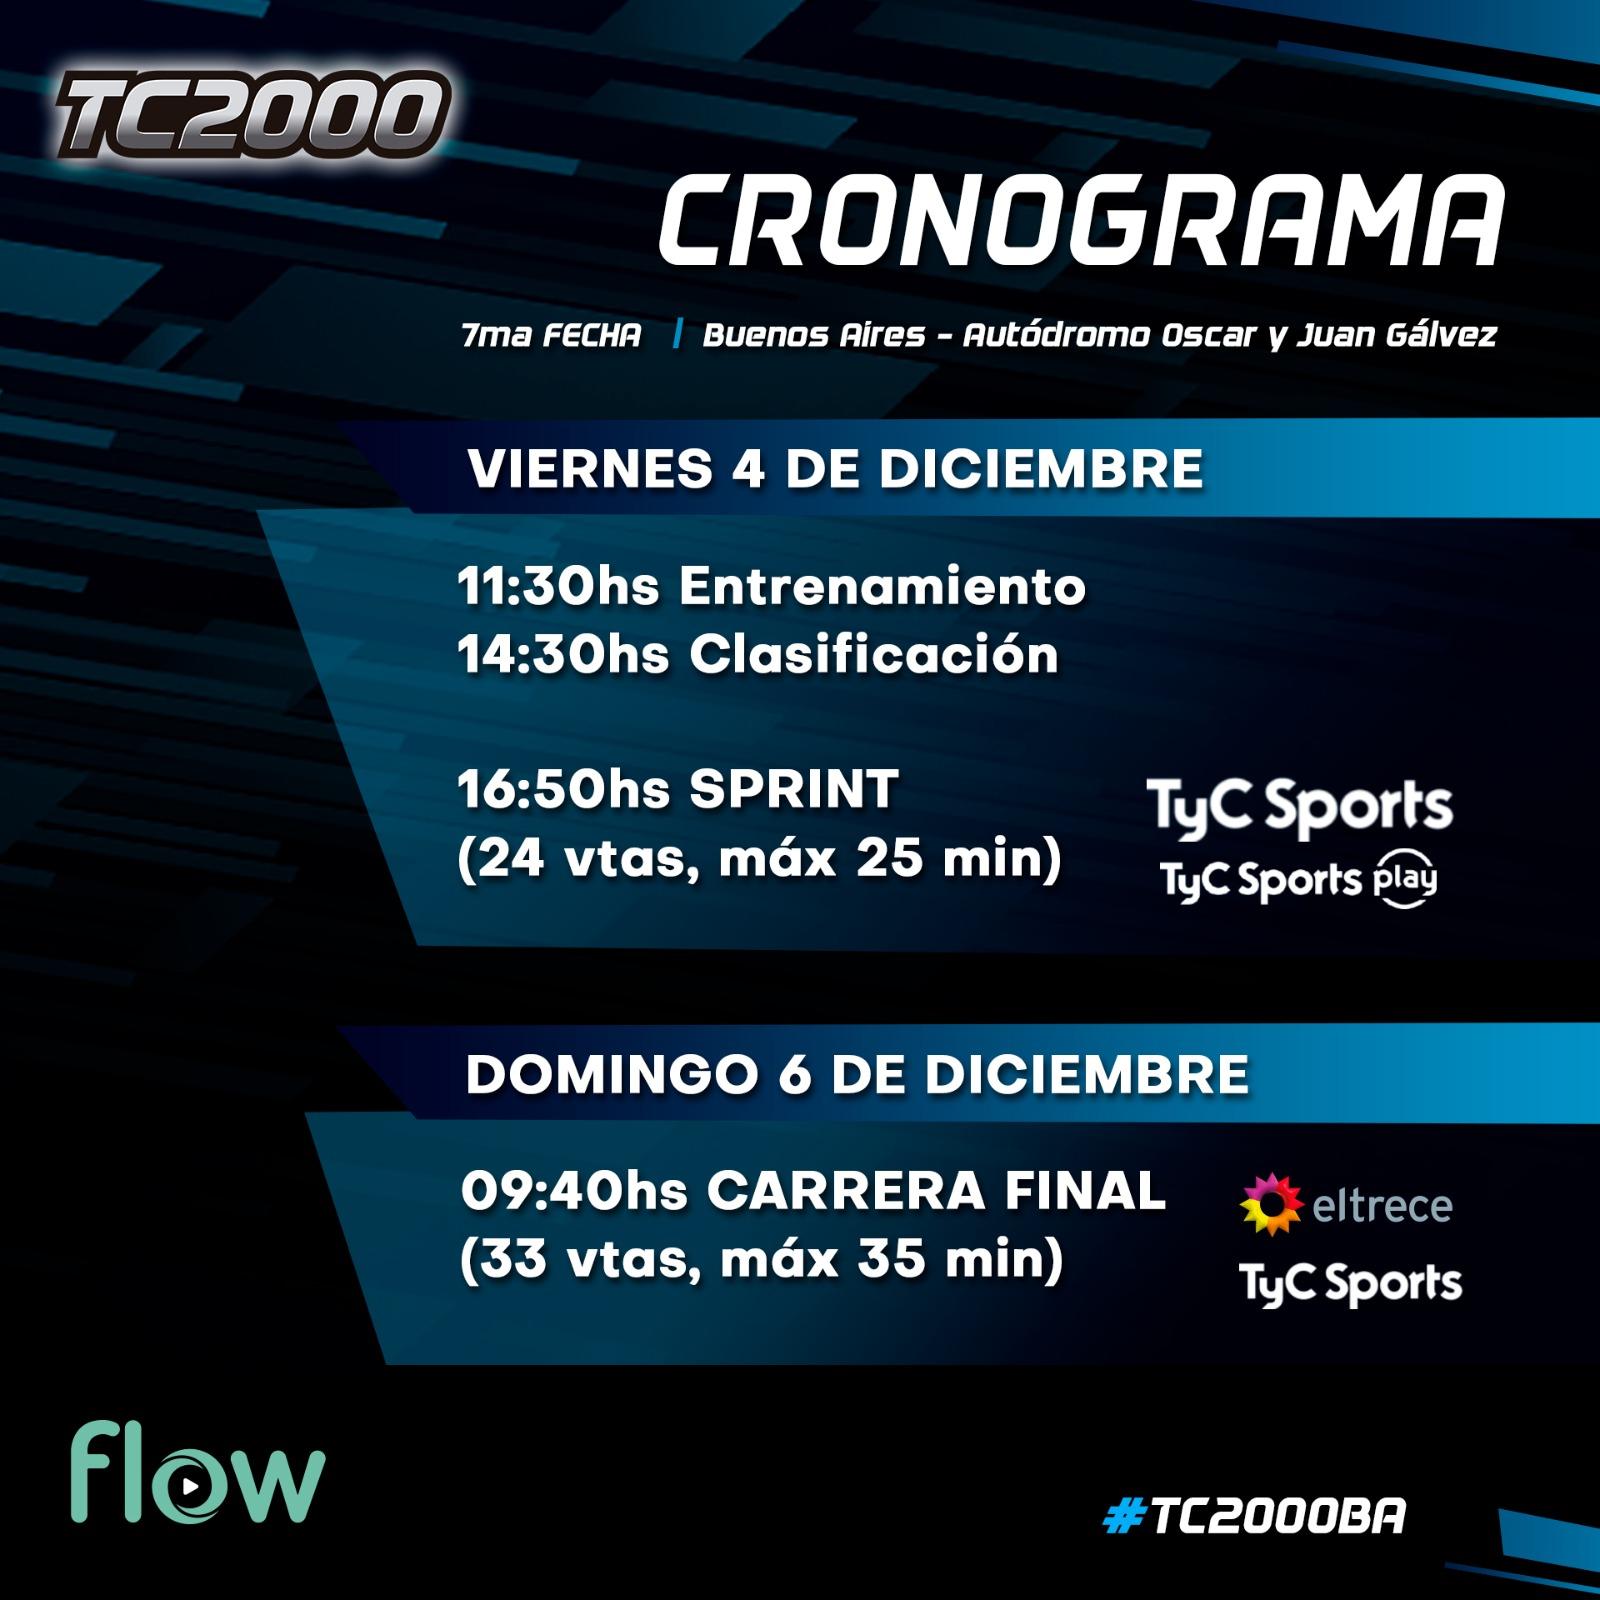 cronograma tc2000 argentino